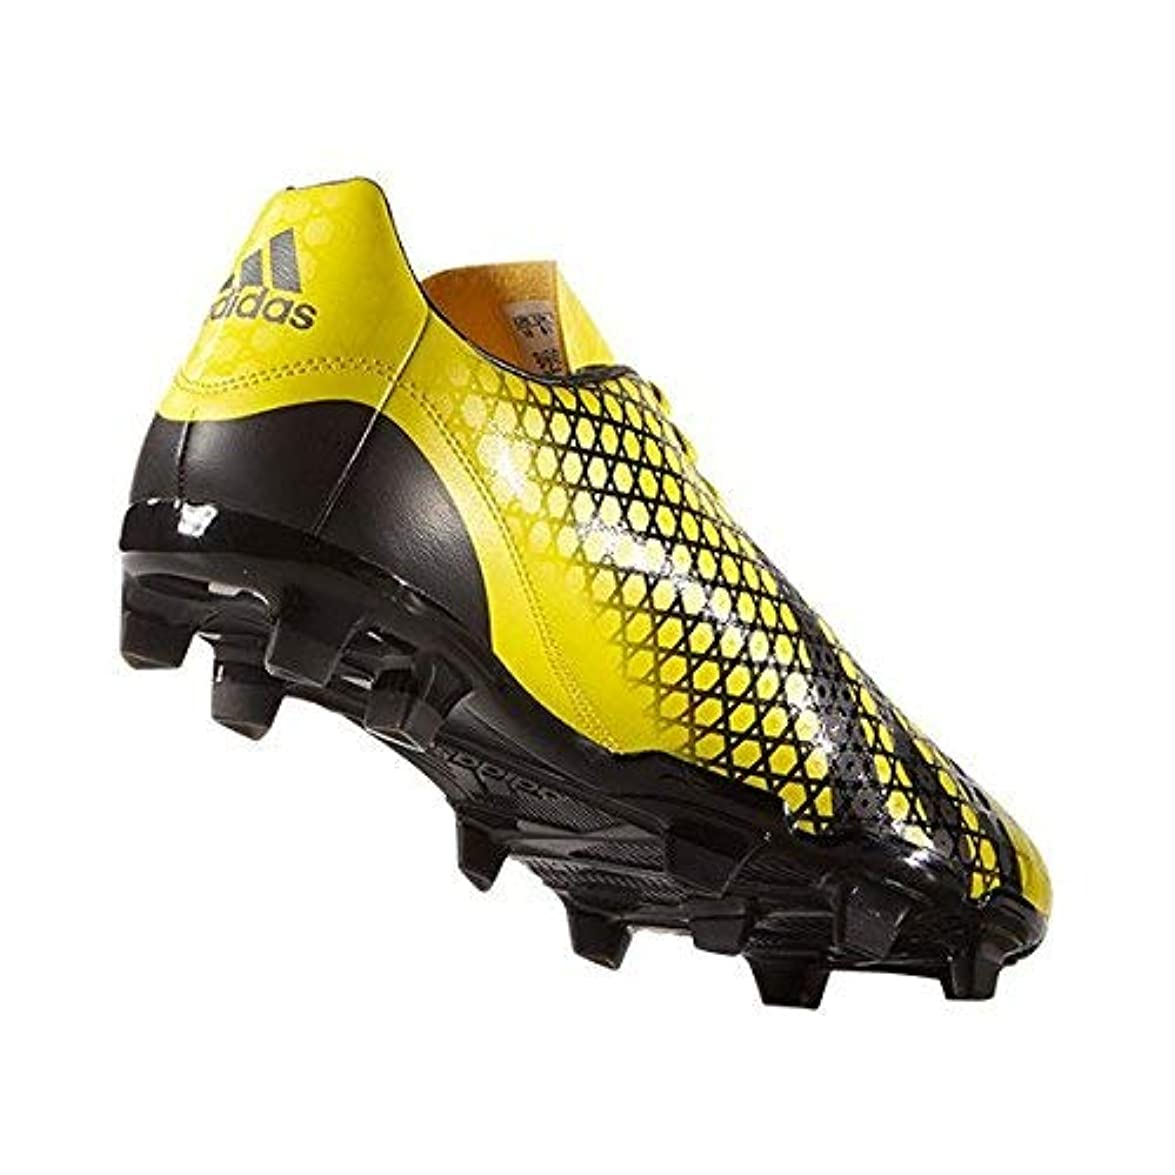 Scarpa Uomo Fg Rugby Incurza Adidas Da